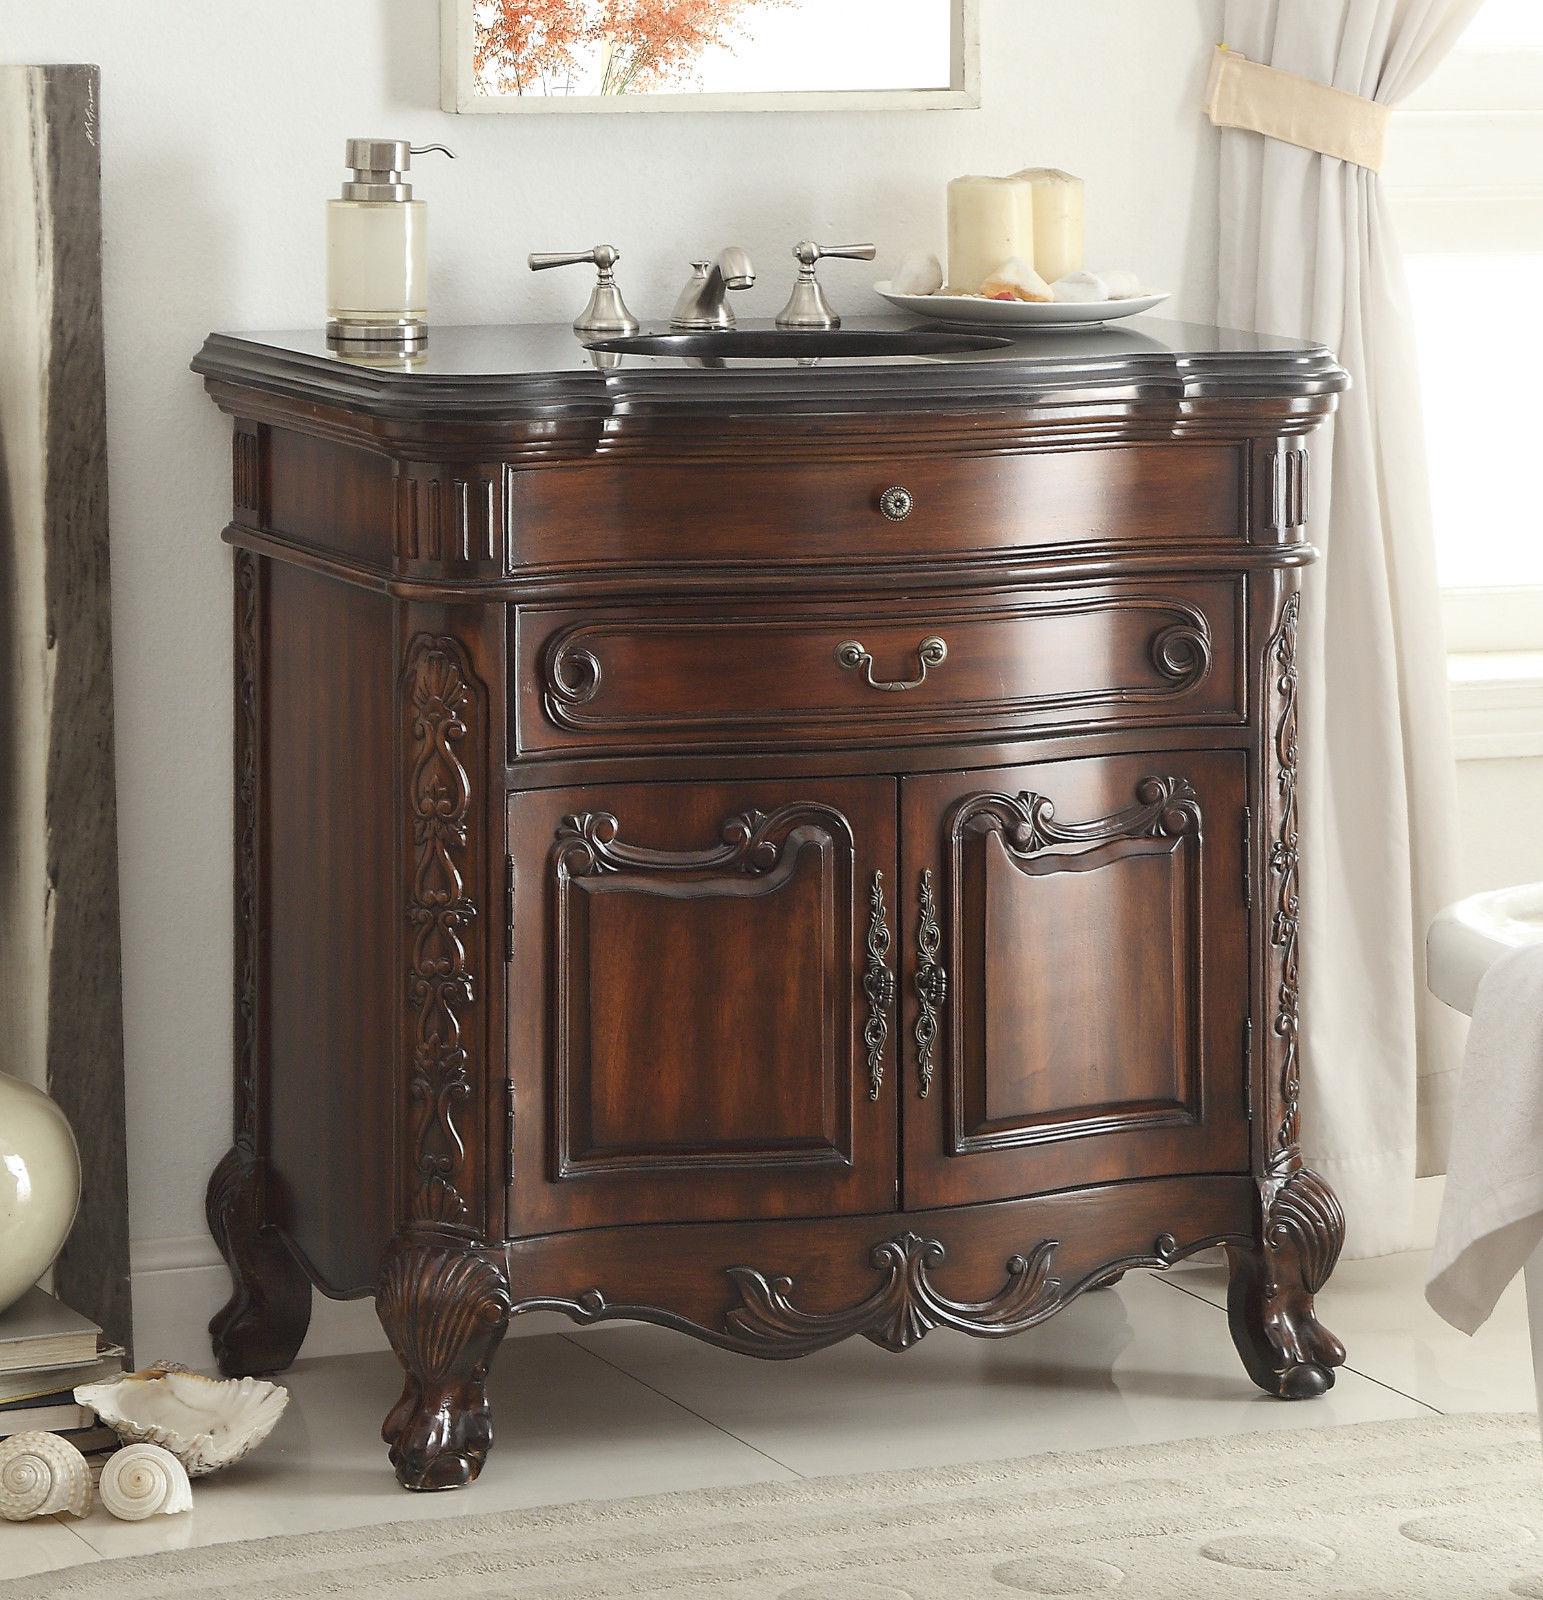 36 inch Adelina Antique Mahogany Bathroom Sink Vanity